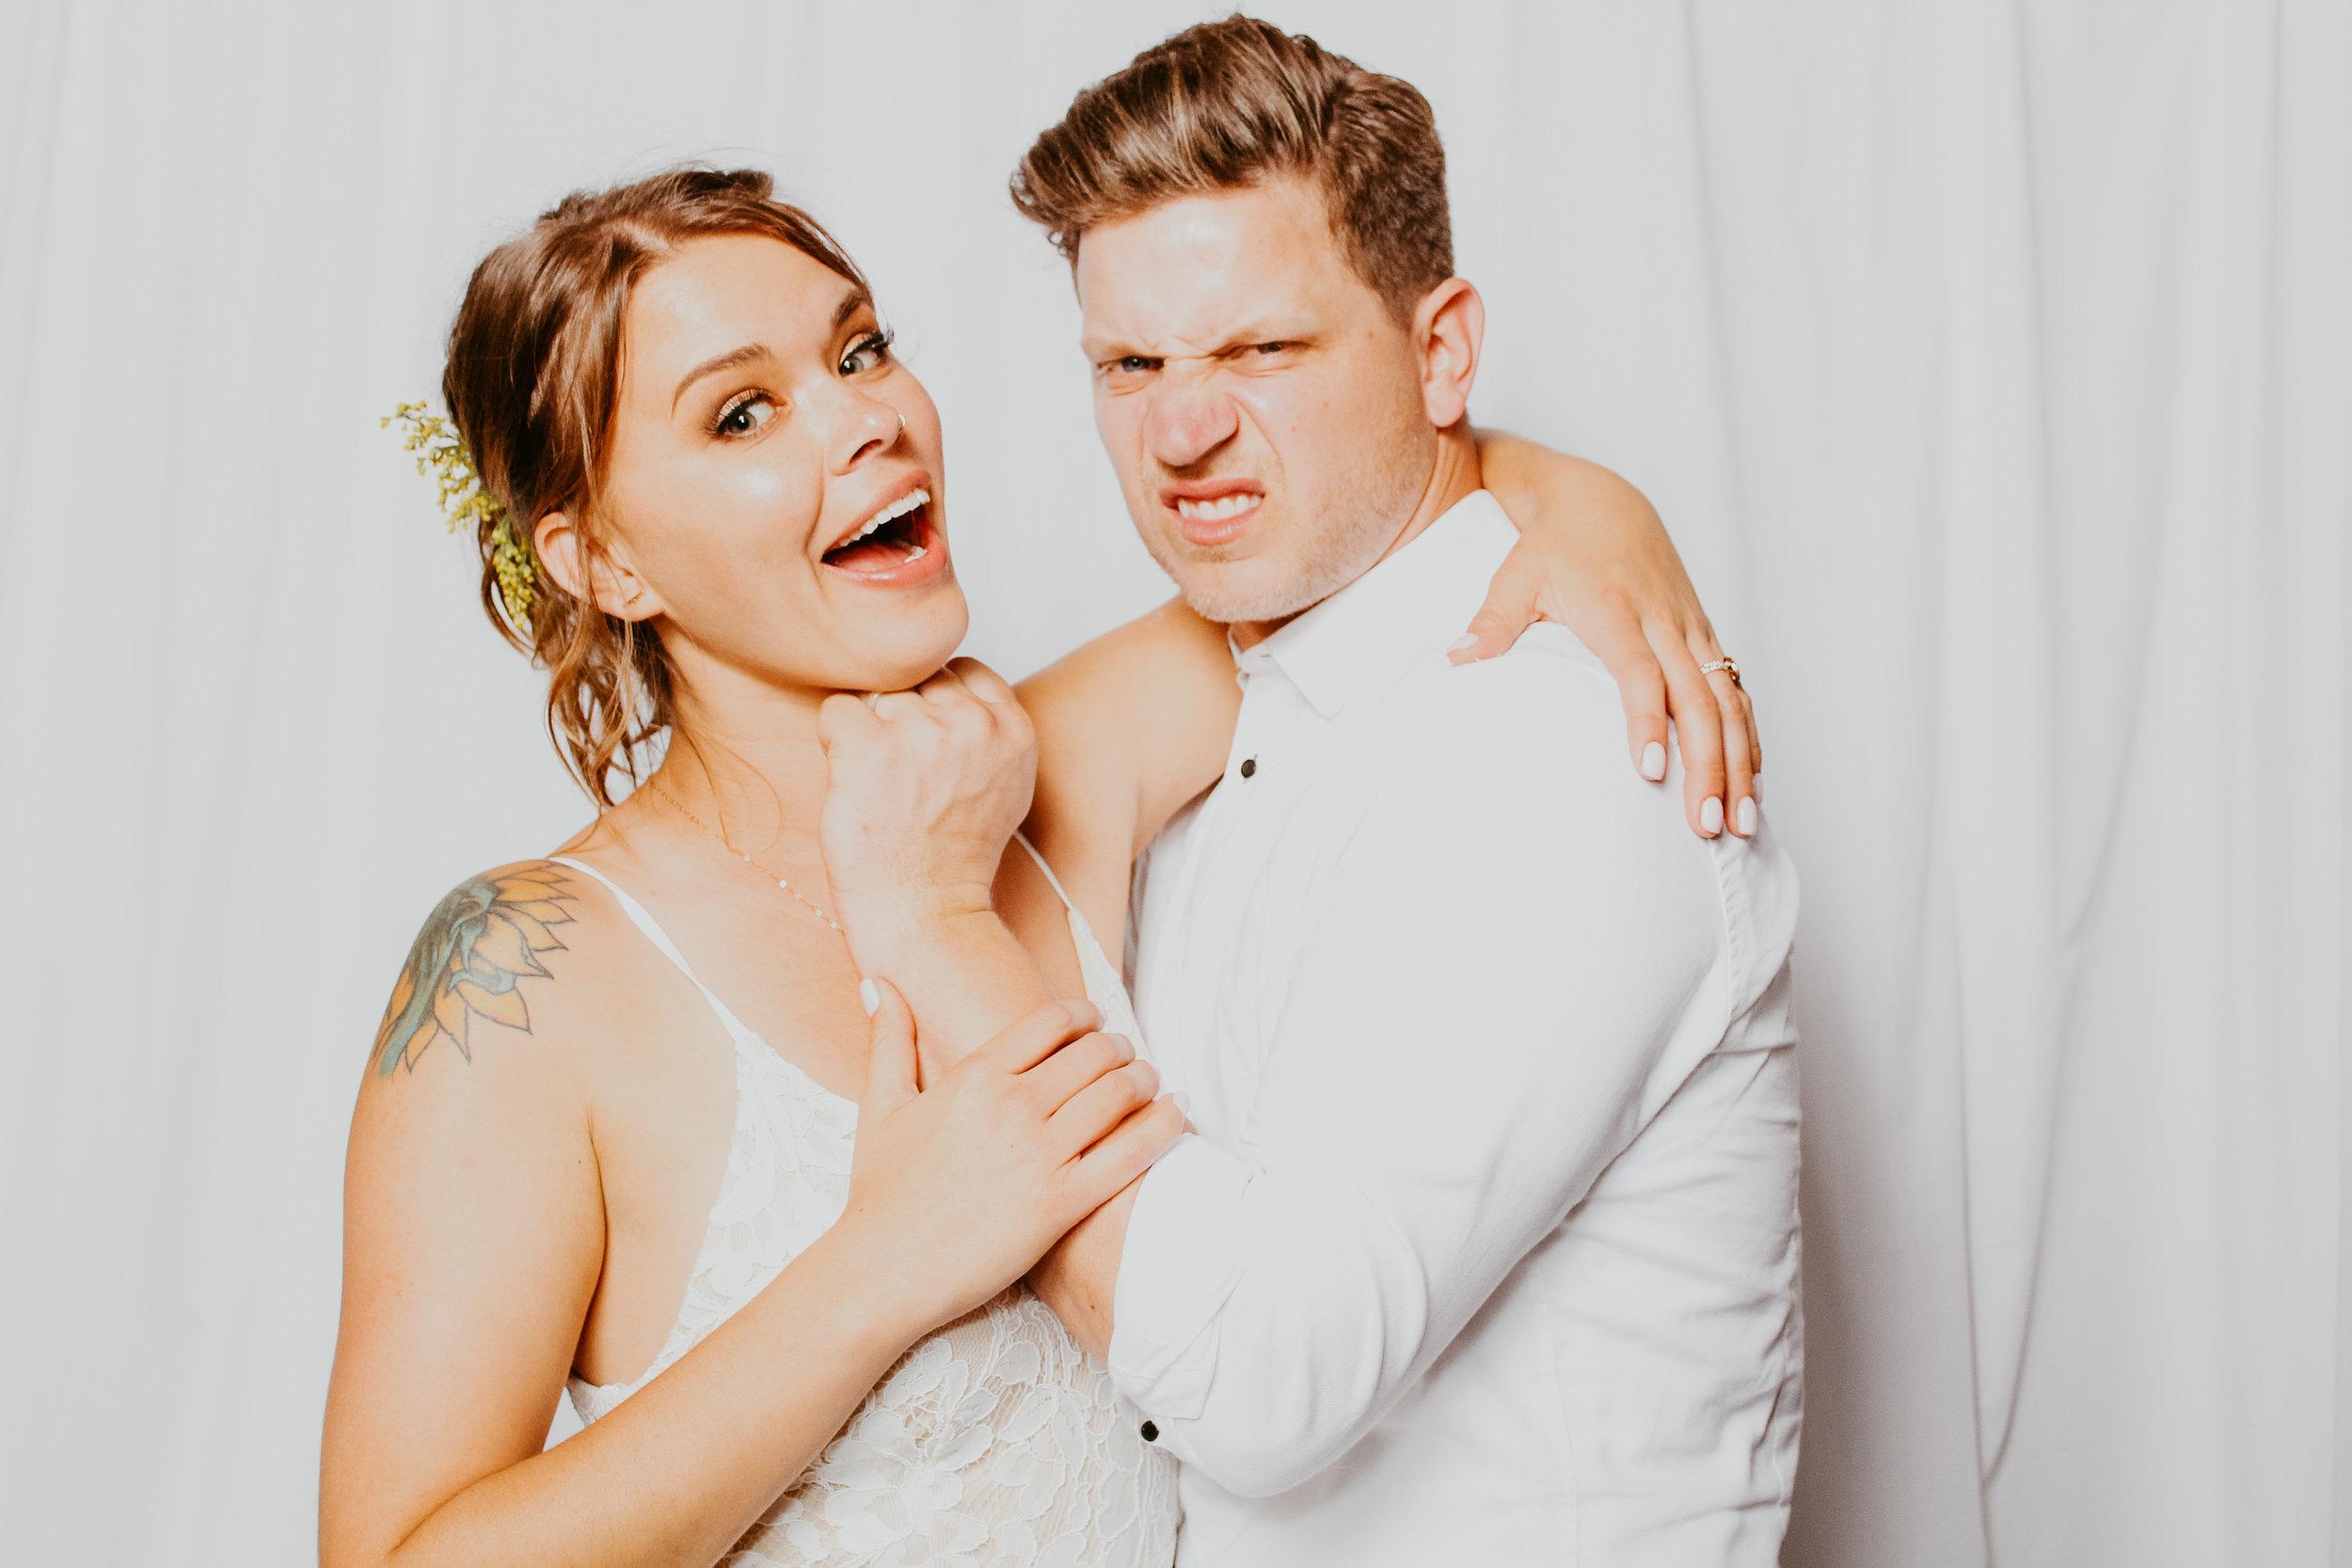 Diamond Bar Wedding Photo Booth Rental